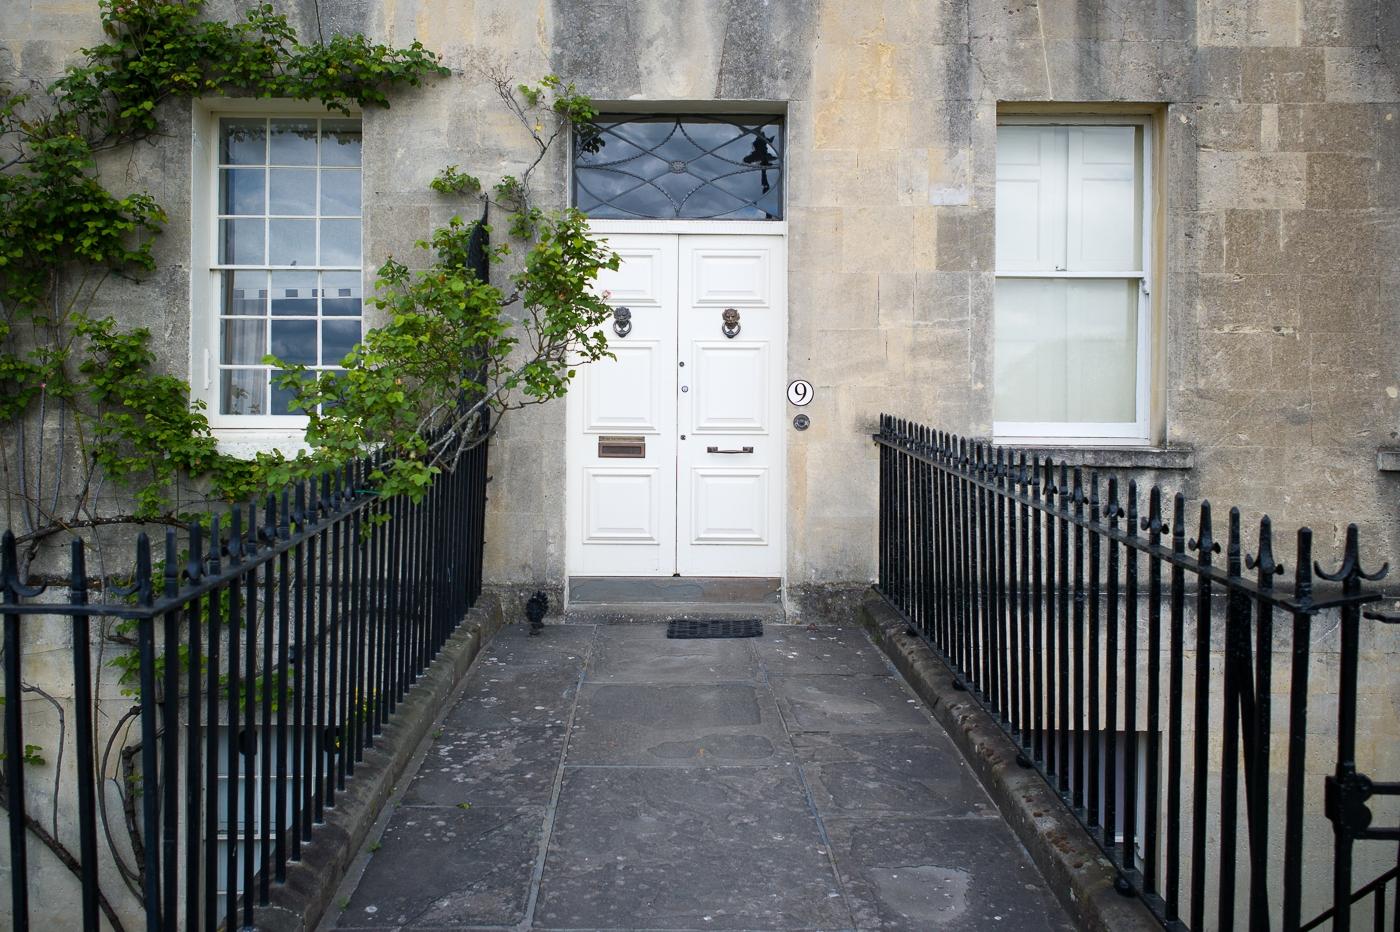 Doorway at the Royal Crescent, Bath